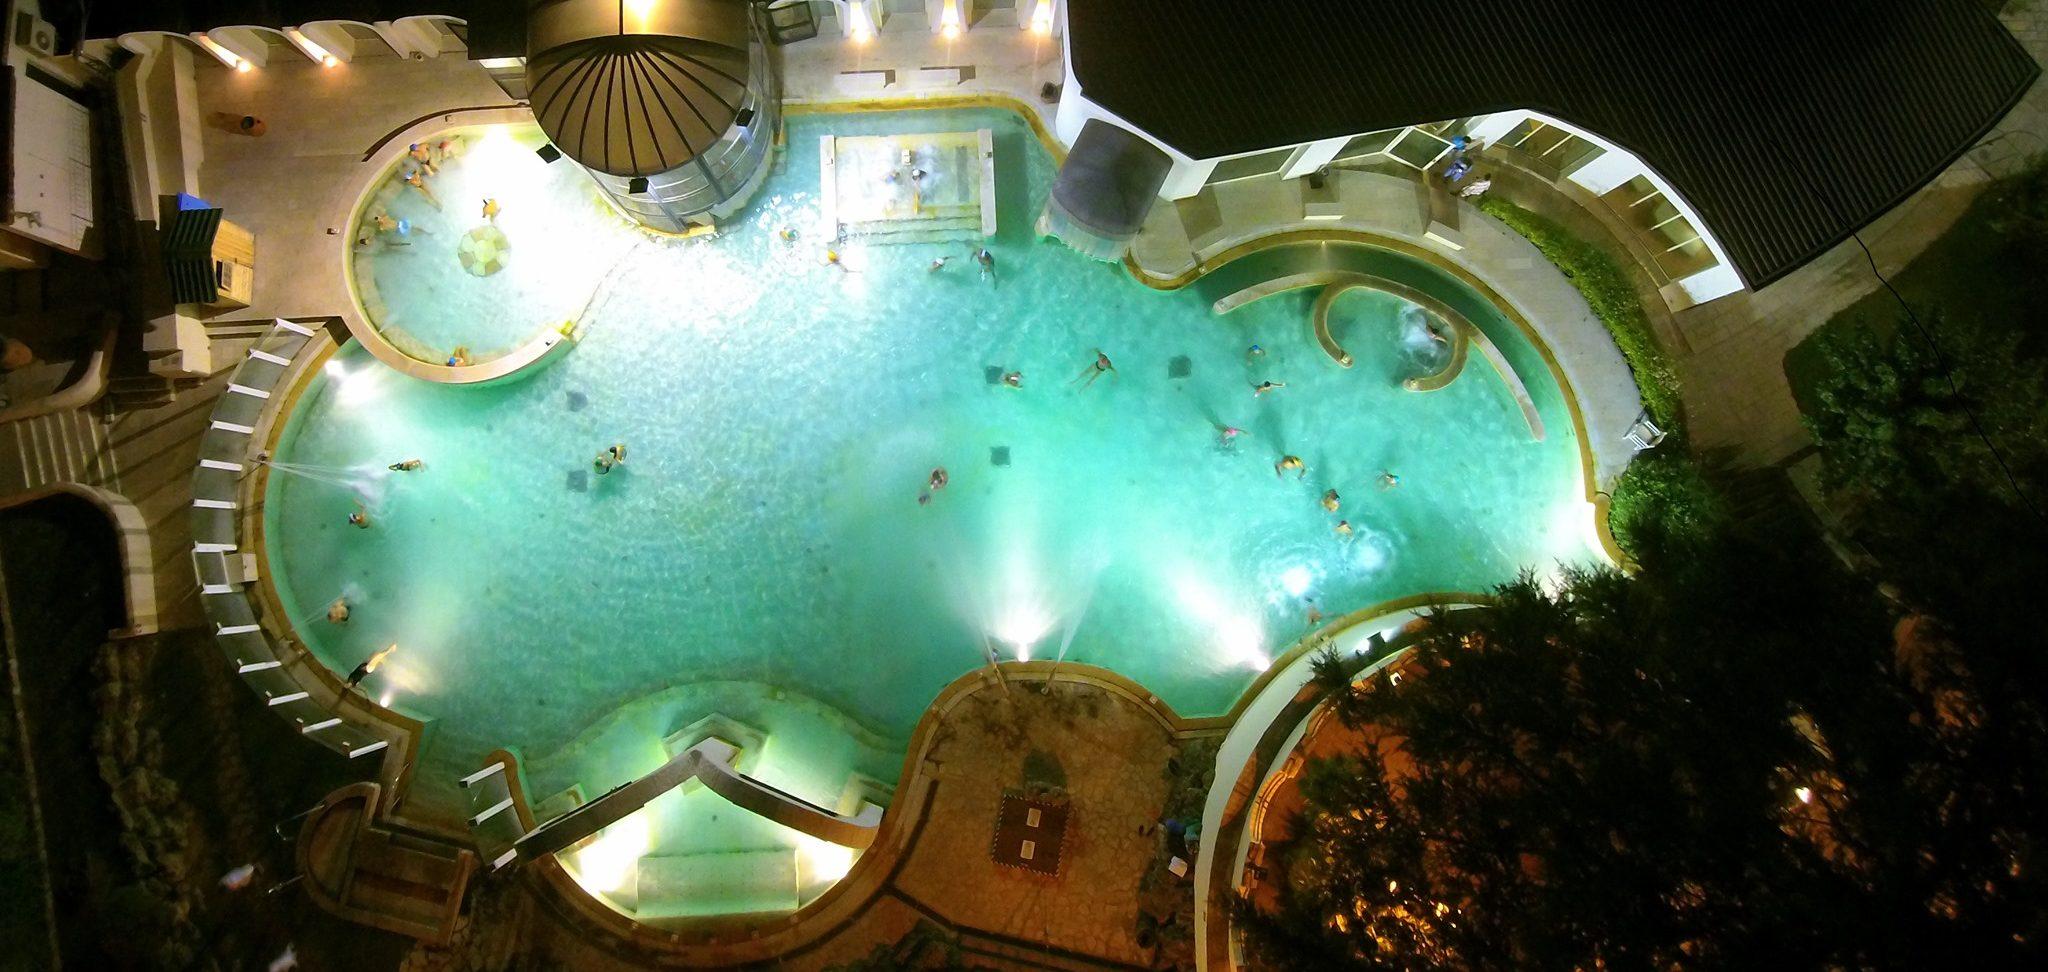 Apertura della piscina termale e bagno in notturna | Casciana Terme